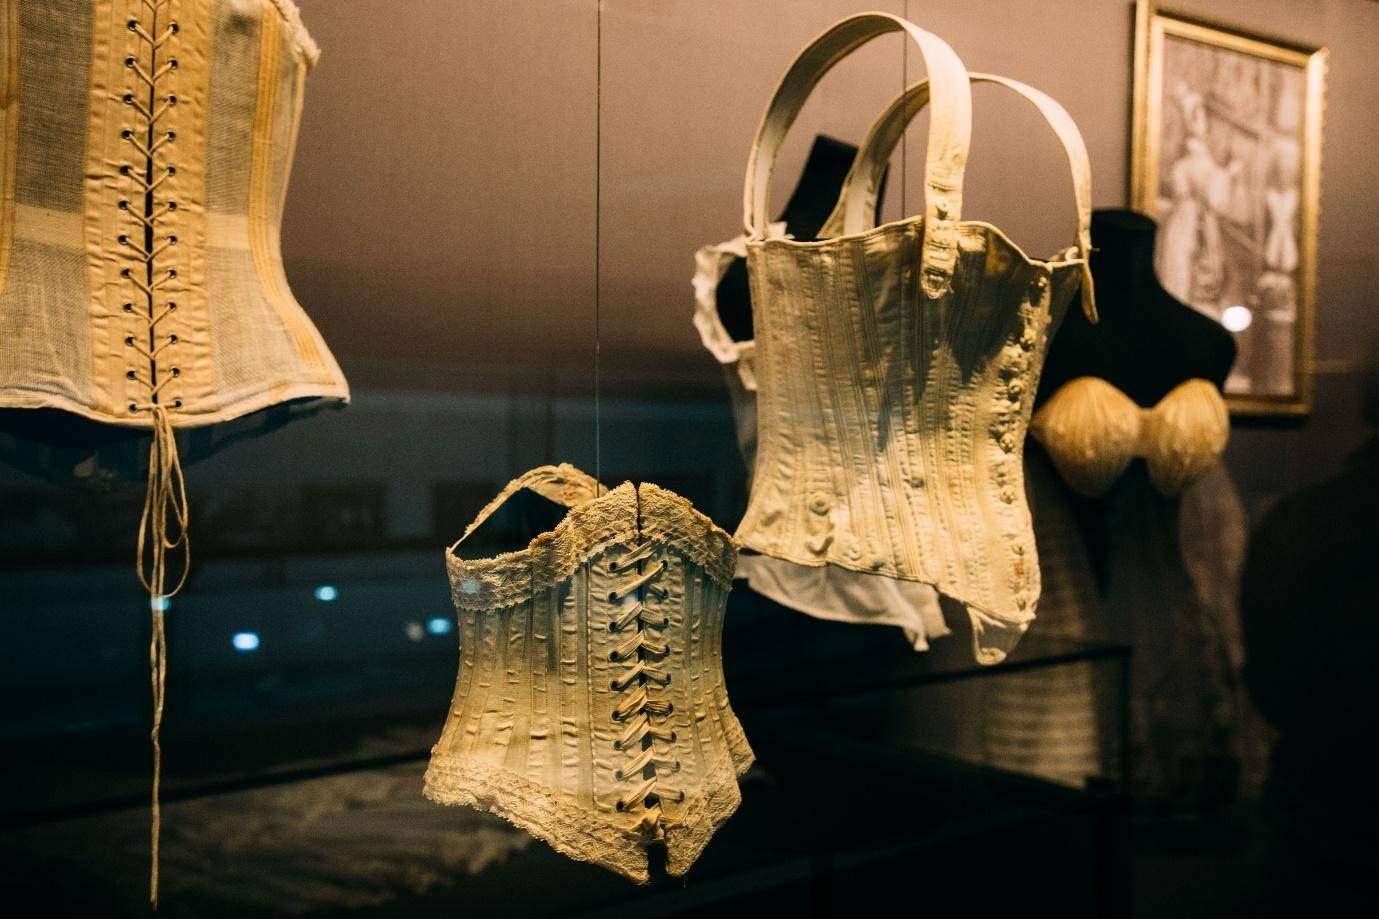 Fabric of corset dress